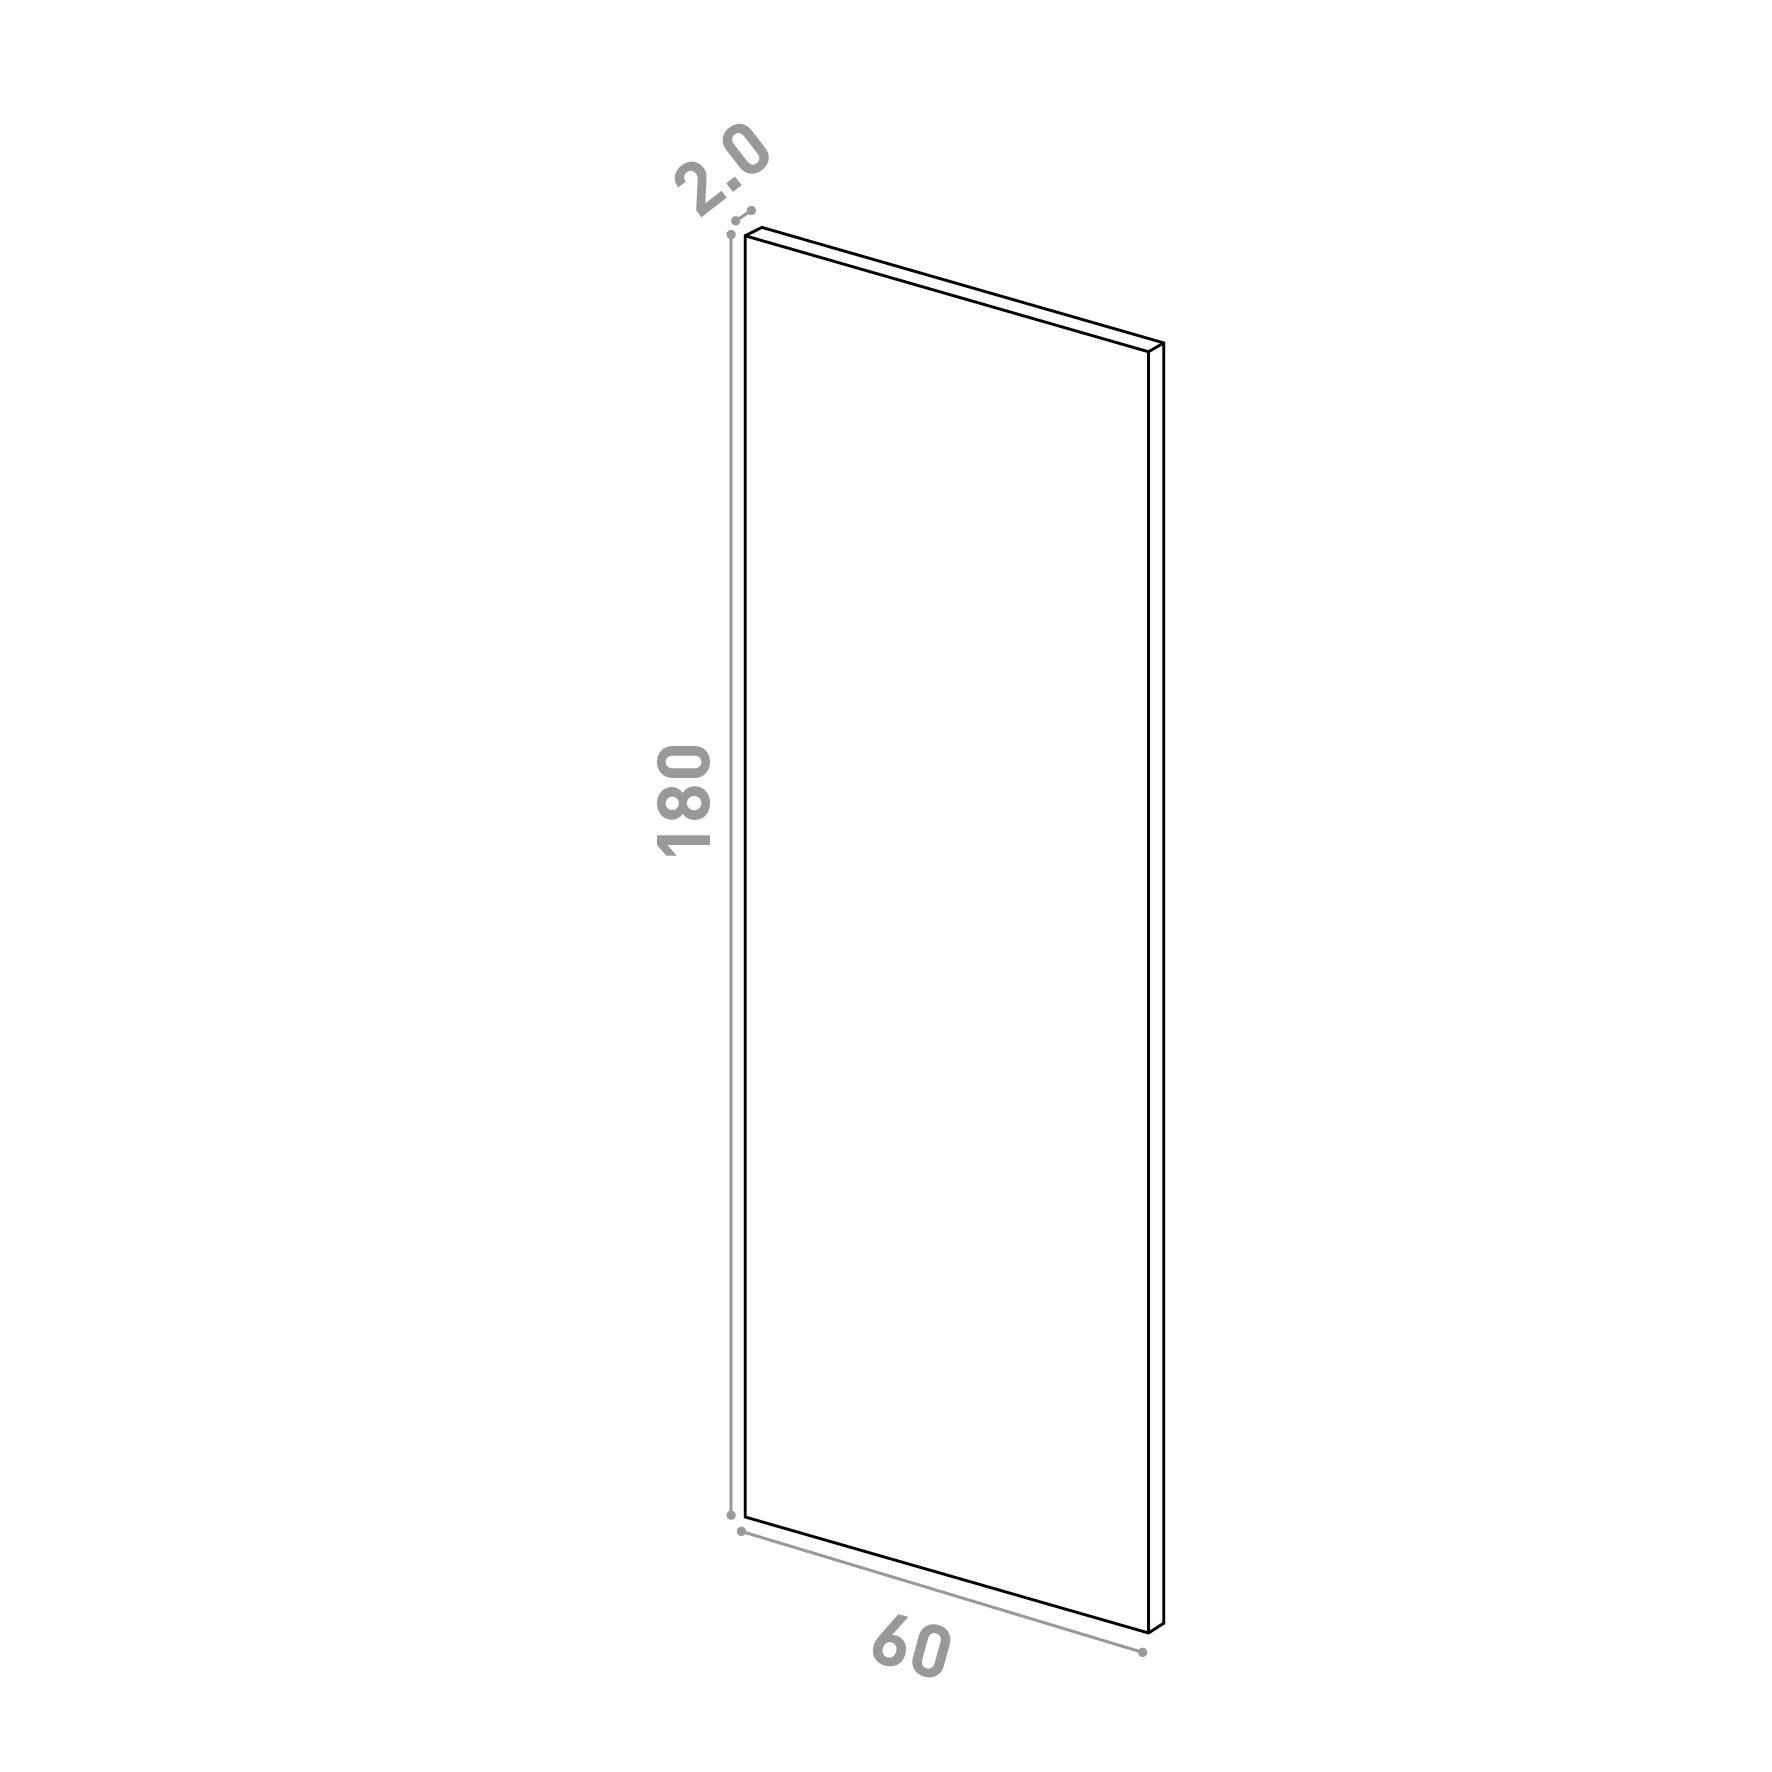 Porte 60X180cm   design lisse   chêne naturel